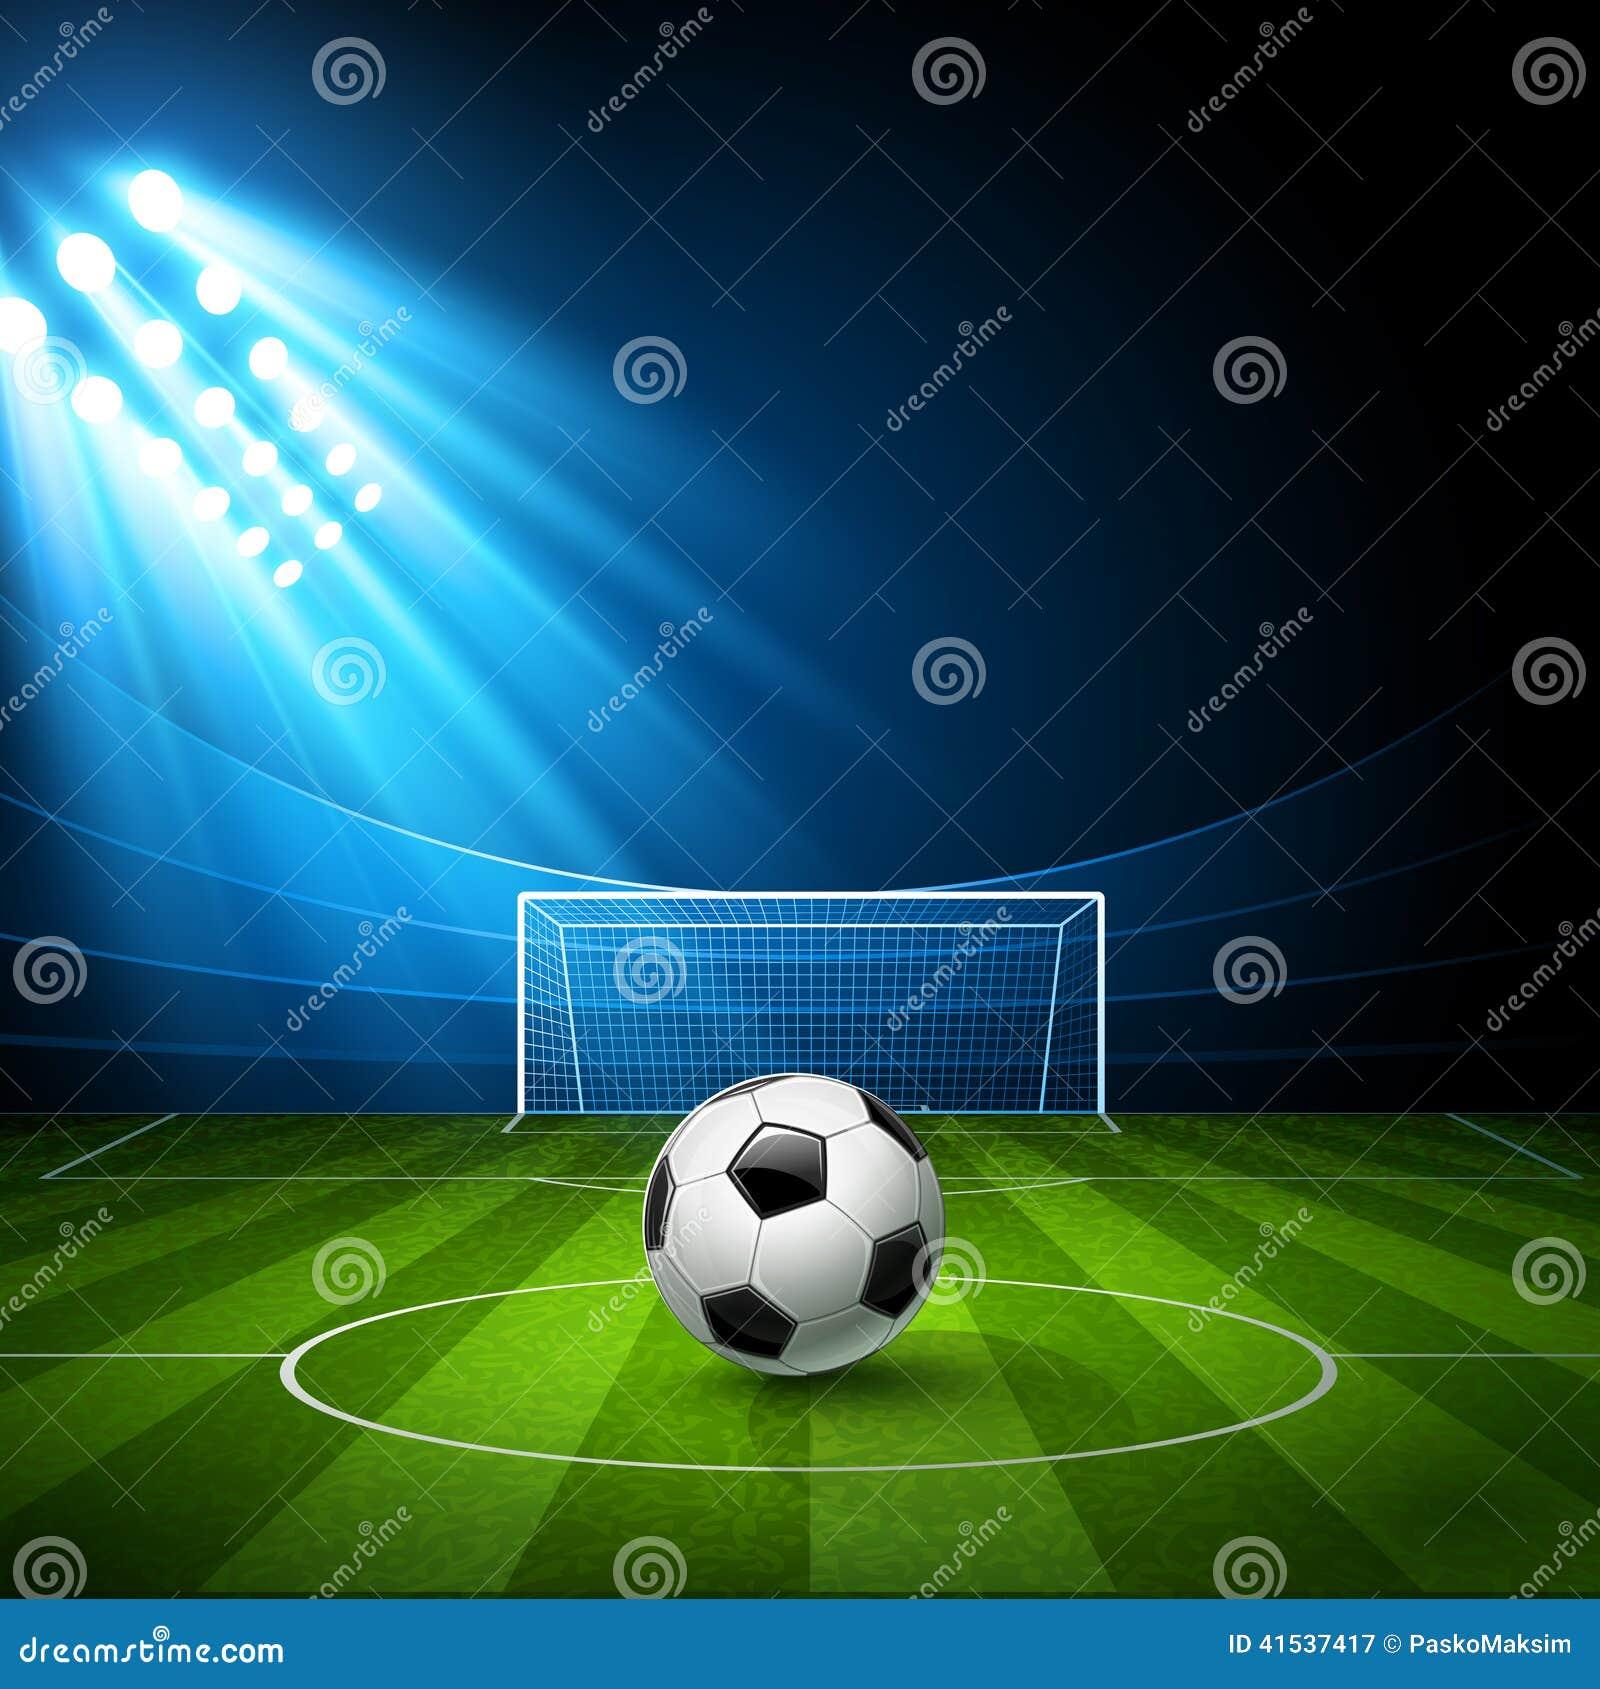 Stadium Lights Svg: Football Arena, Stadium With A Soccer Ball Stock Vector